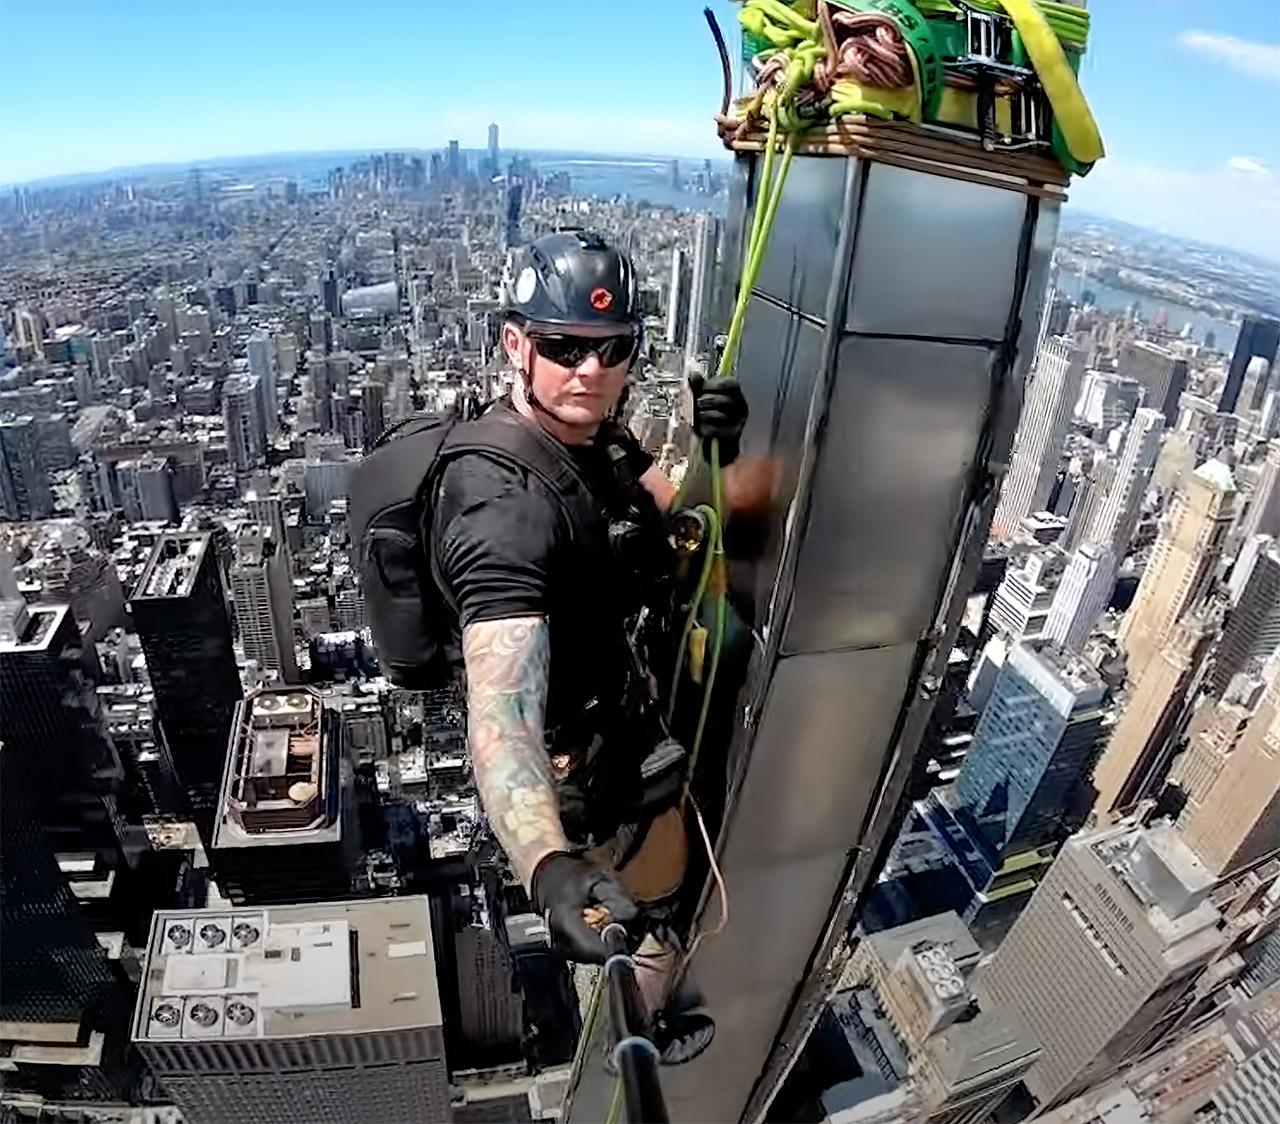 Steeplejack View Top Chrysler Building New York